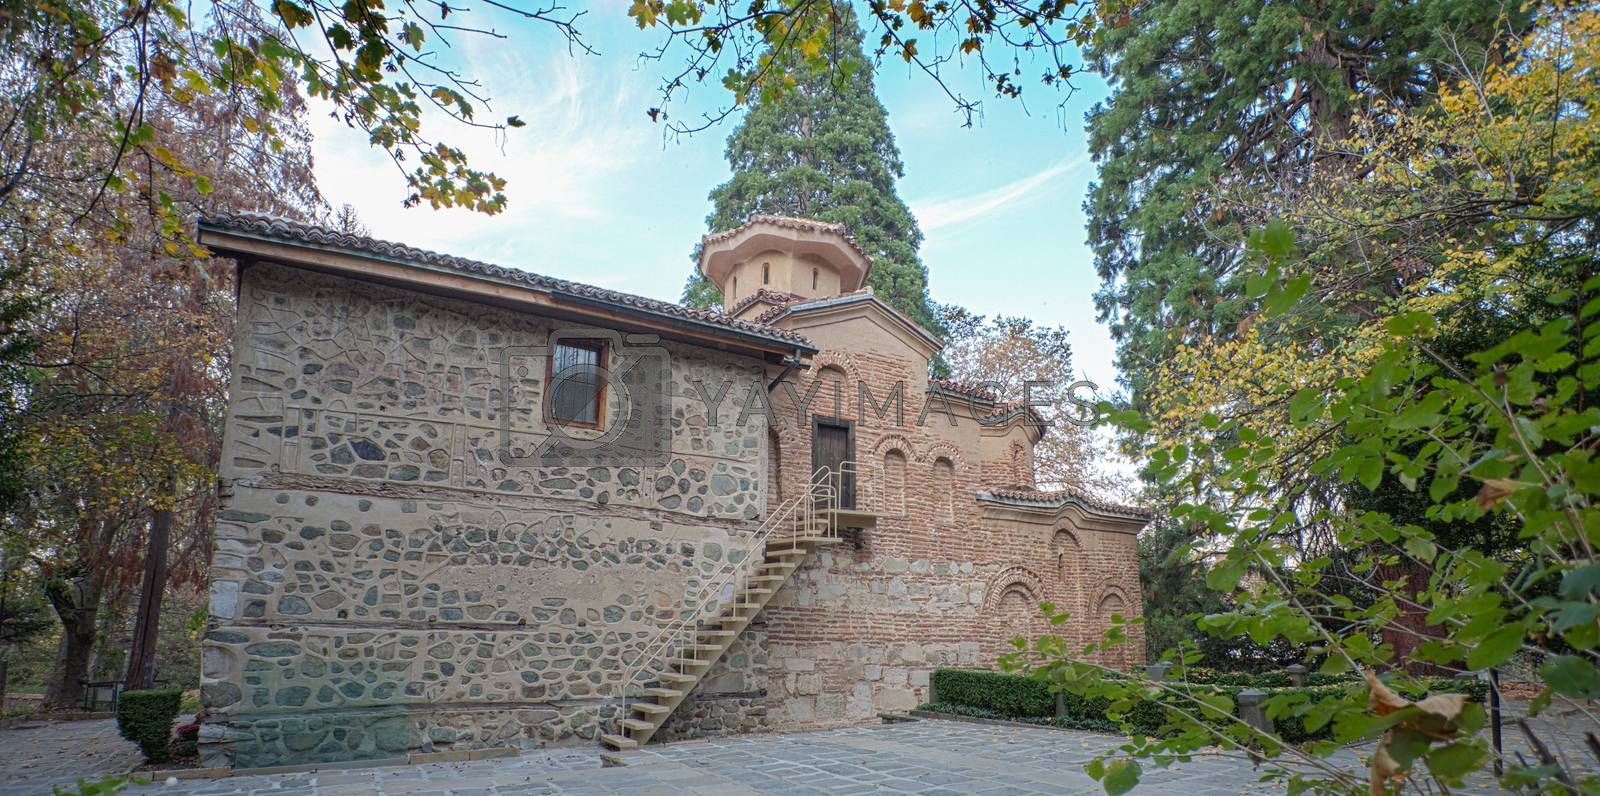 The Boyana church in Sofia, Bulgaria, Europe